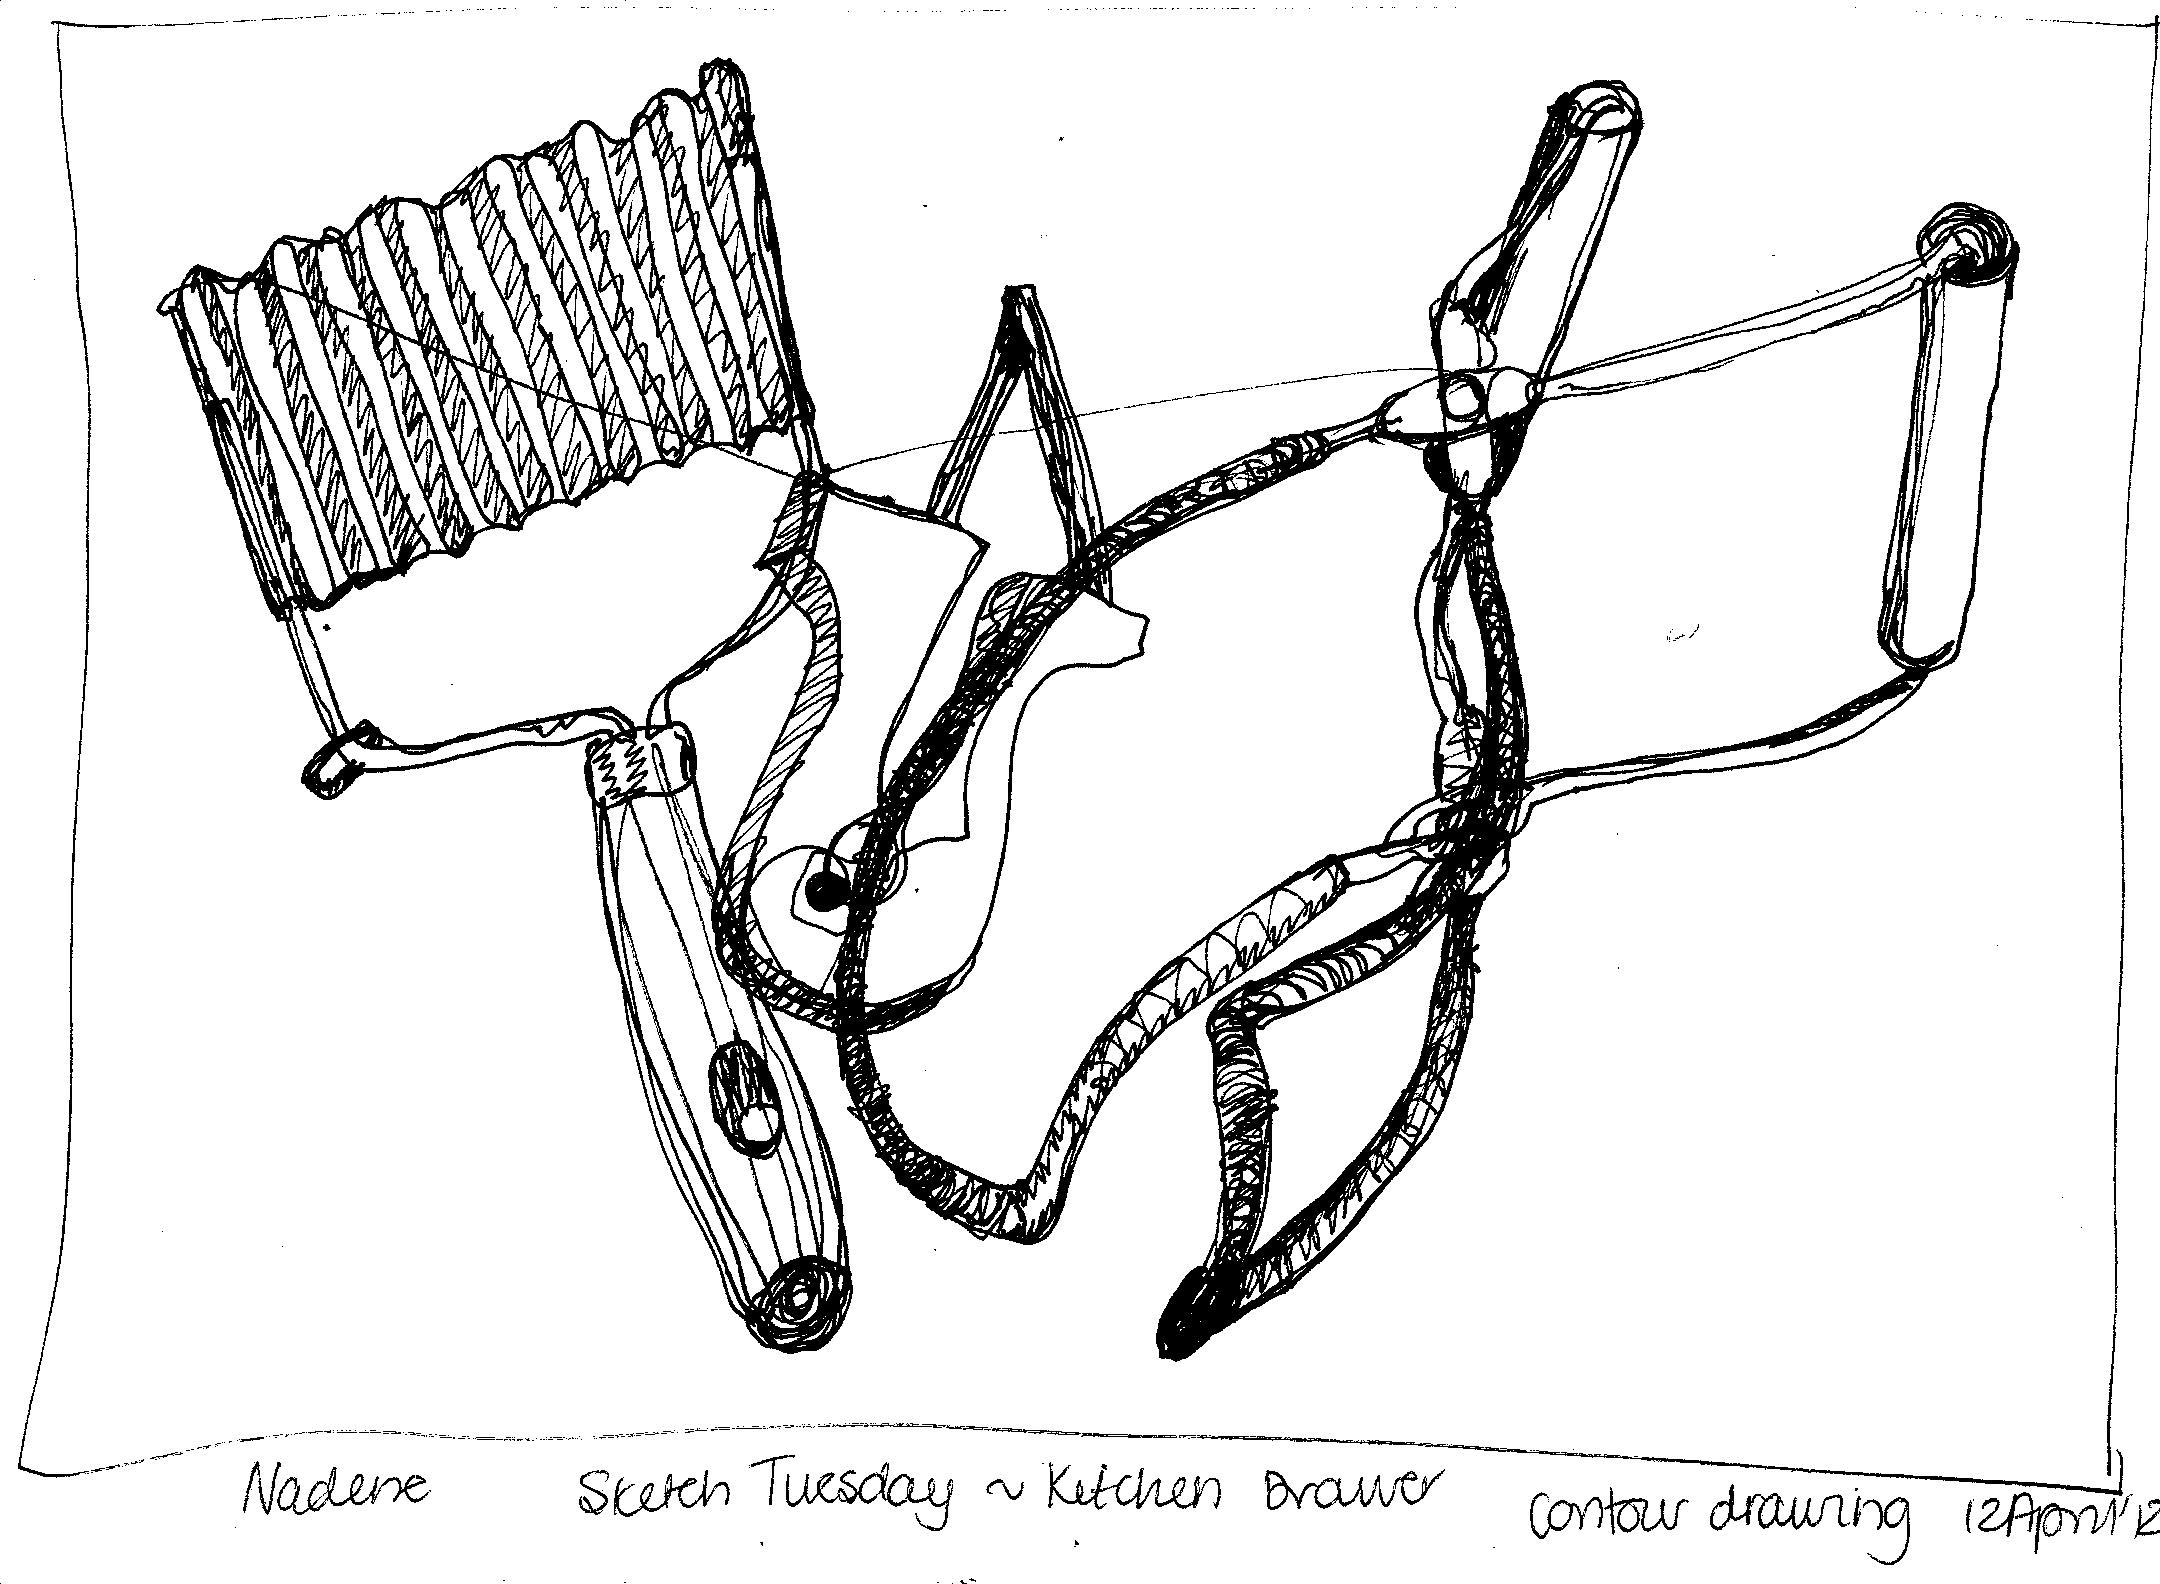 Wooden Cross Sketch Templates